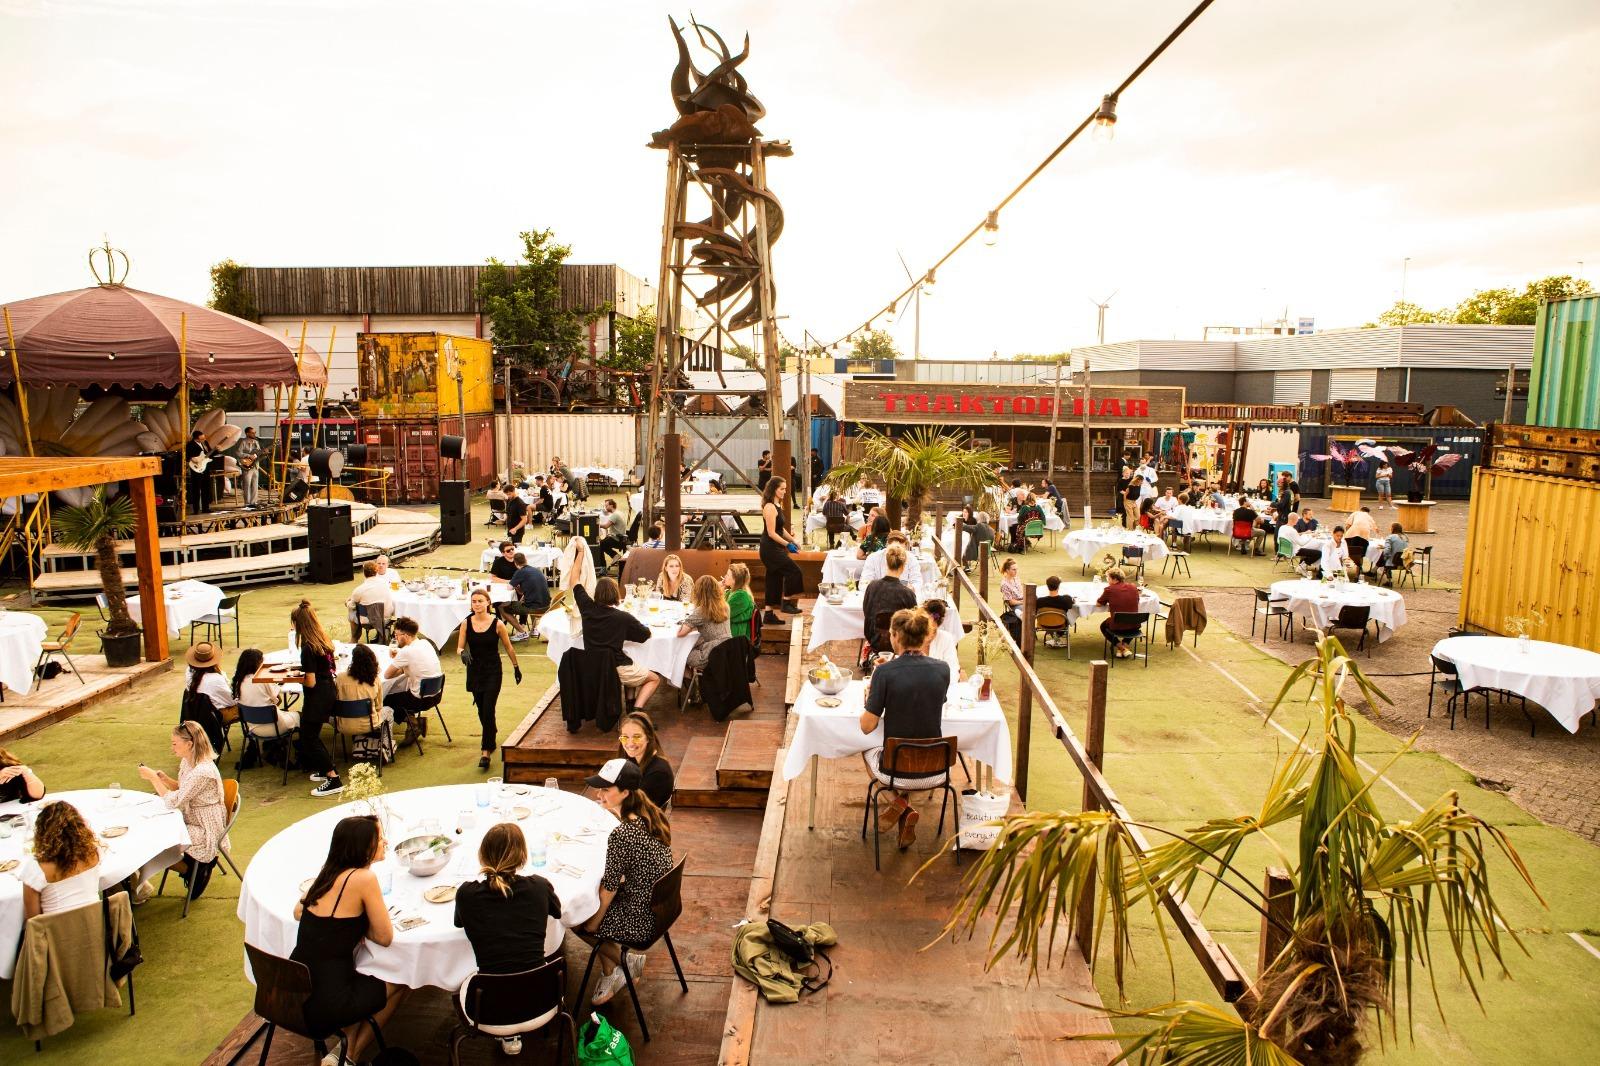 lofi amsterdam - muziekpodium, eetlokaal en expositieruimte amsterdam